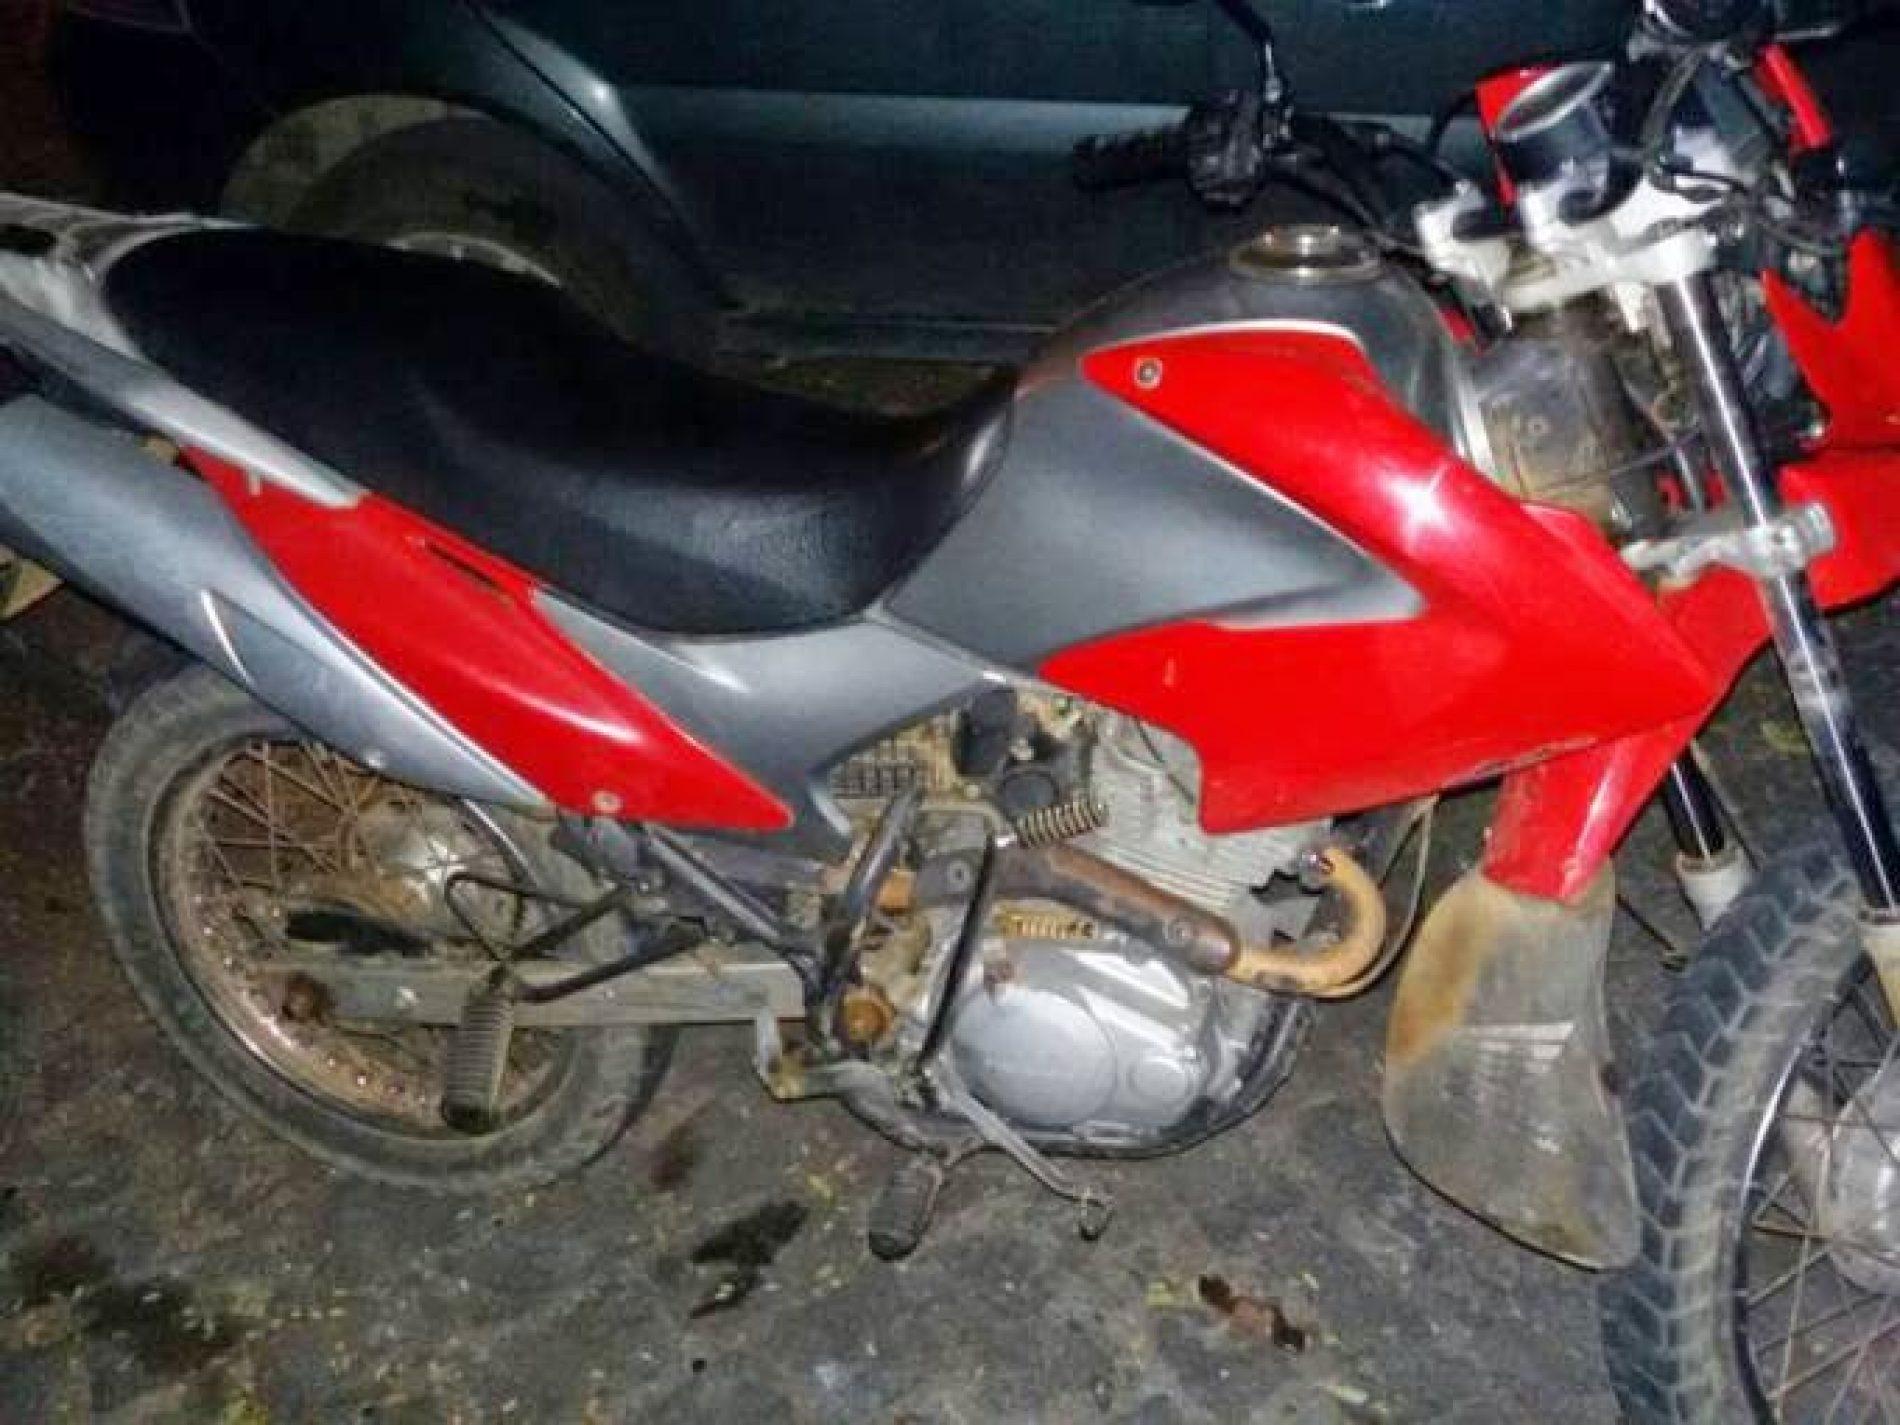 Menor é surpreendido conduzindo moto no bairro Henriqueta